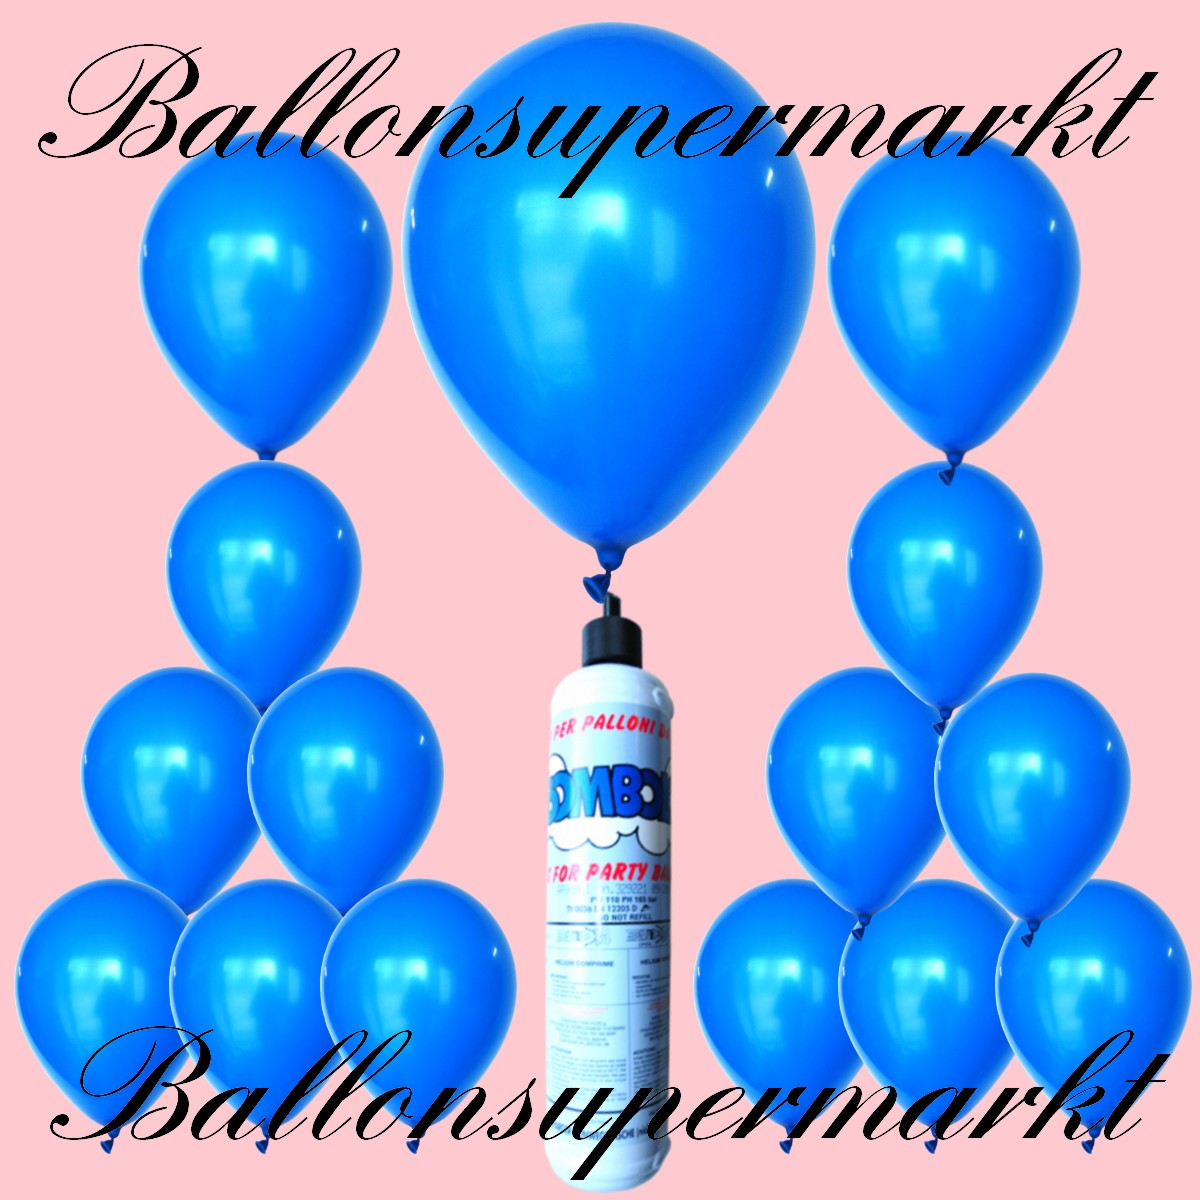 luftballons helium set miniflasche latex luftballons in blau lu luftballons helium mini set. Black Bedroom Furniture Sets. Home Design Ideas